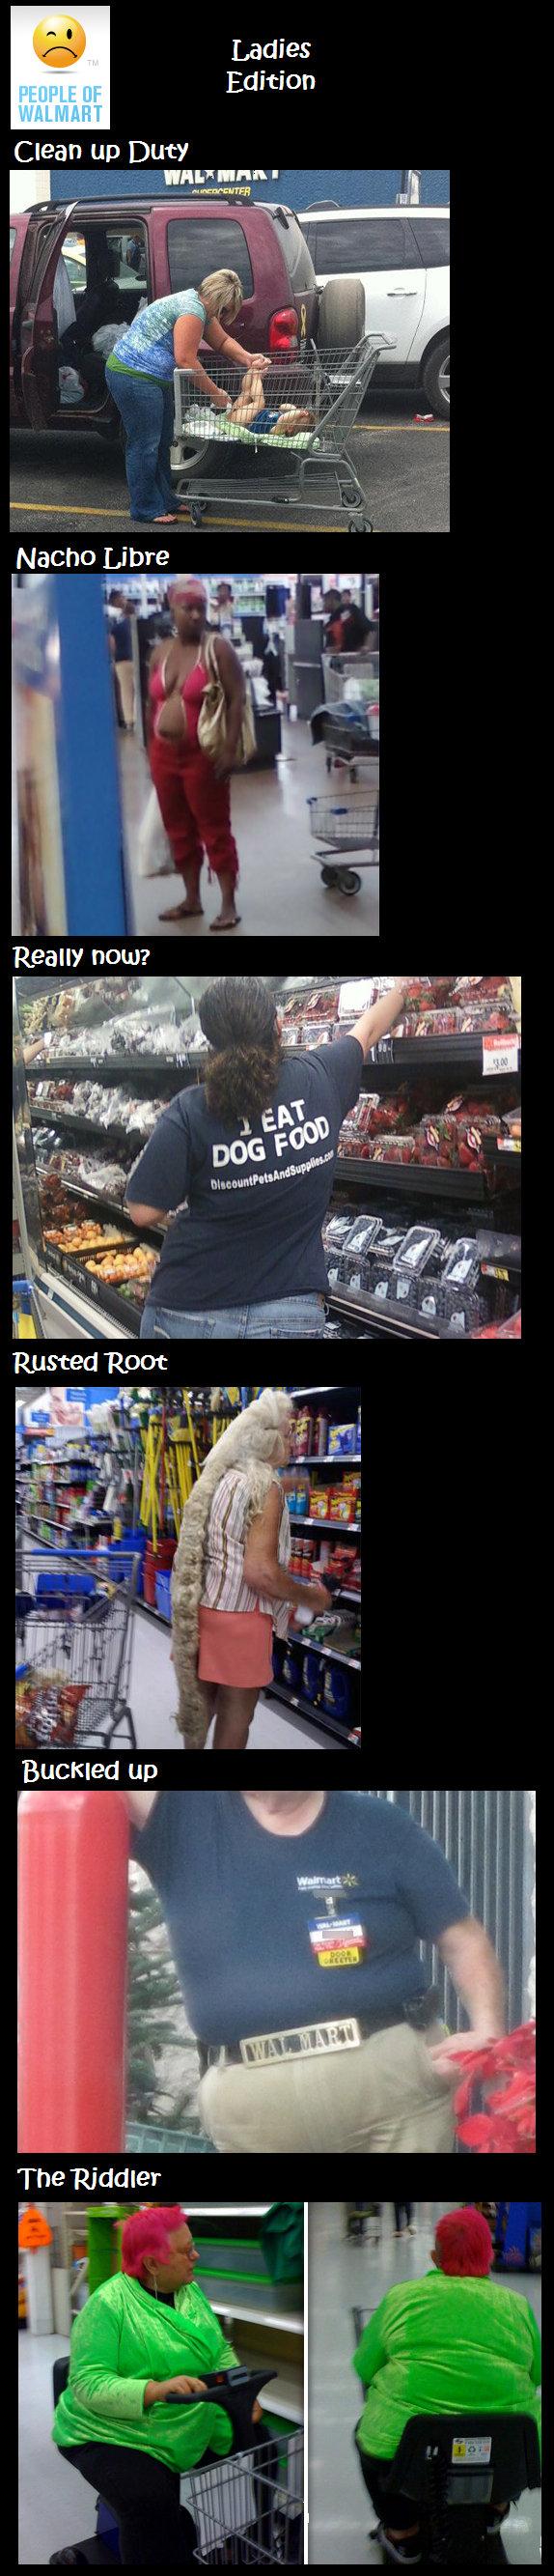 Walmart People. . Ladies Edition Clean up Duty. lmfao the riddler Walmart weirdos funny Bacon Scandium